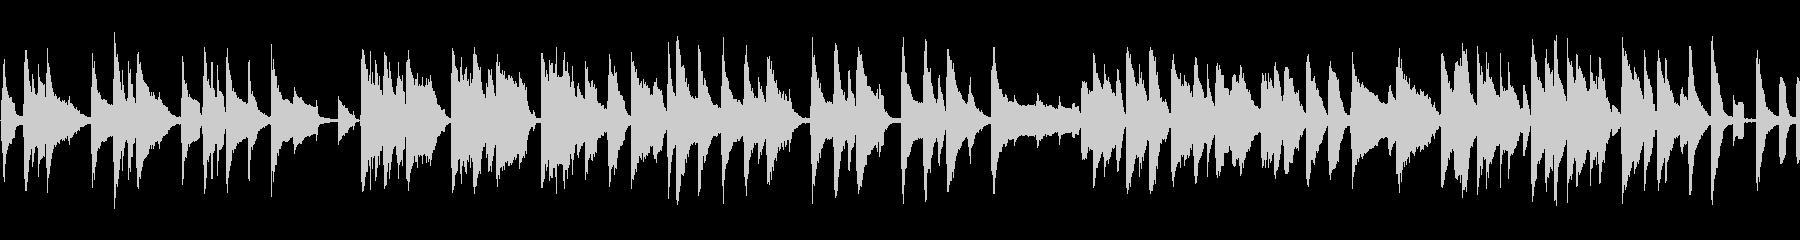 Cartoon ピアノ 木琴 バン...の未再生の波形